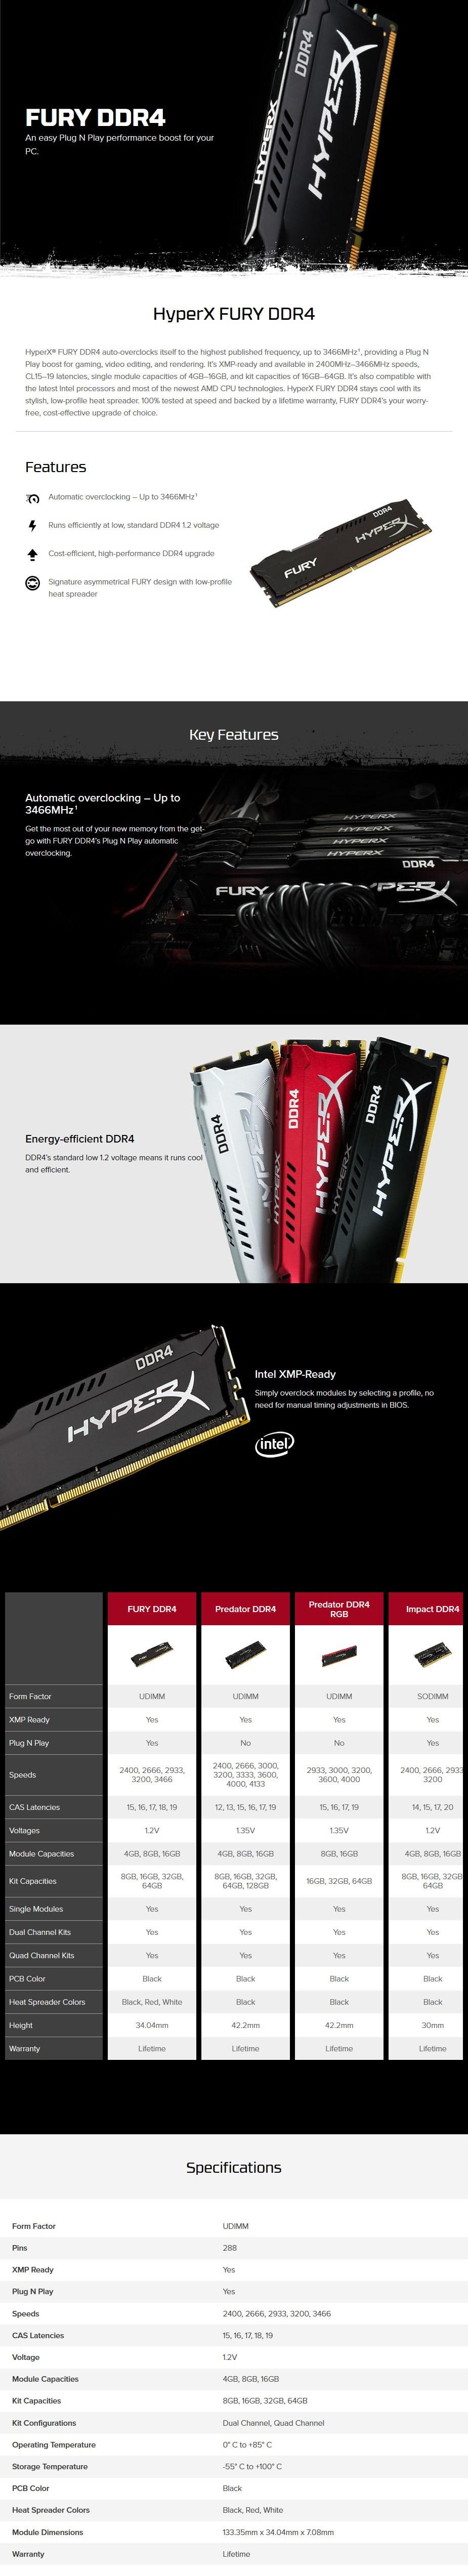 Kingston HyperX FURY 16GB (2x 8GB) DDR4 3200MHz Memory Black  - Overview 1